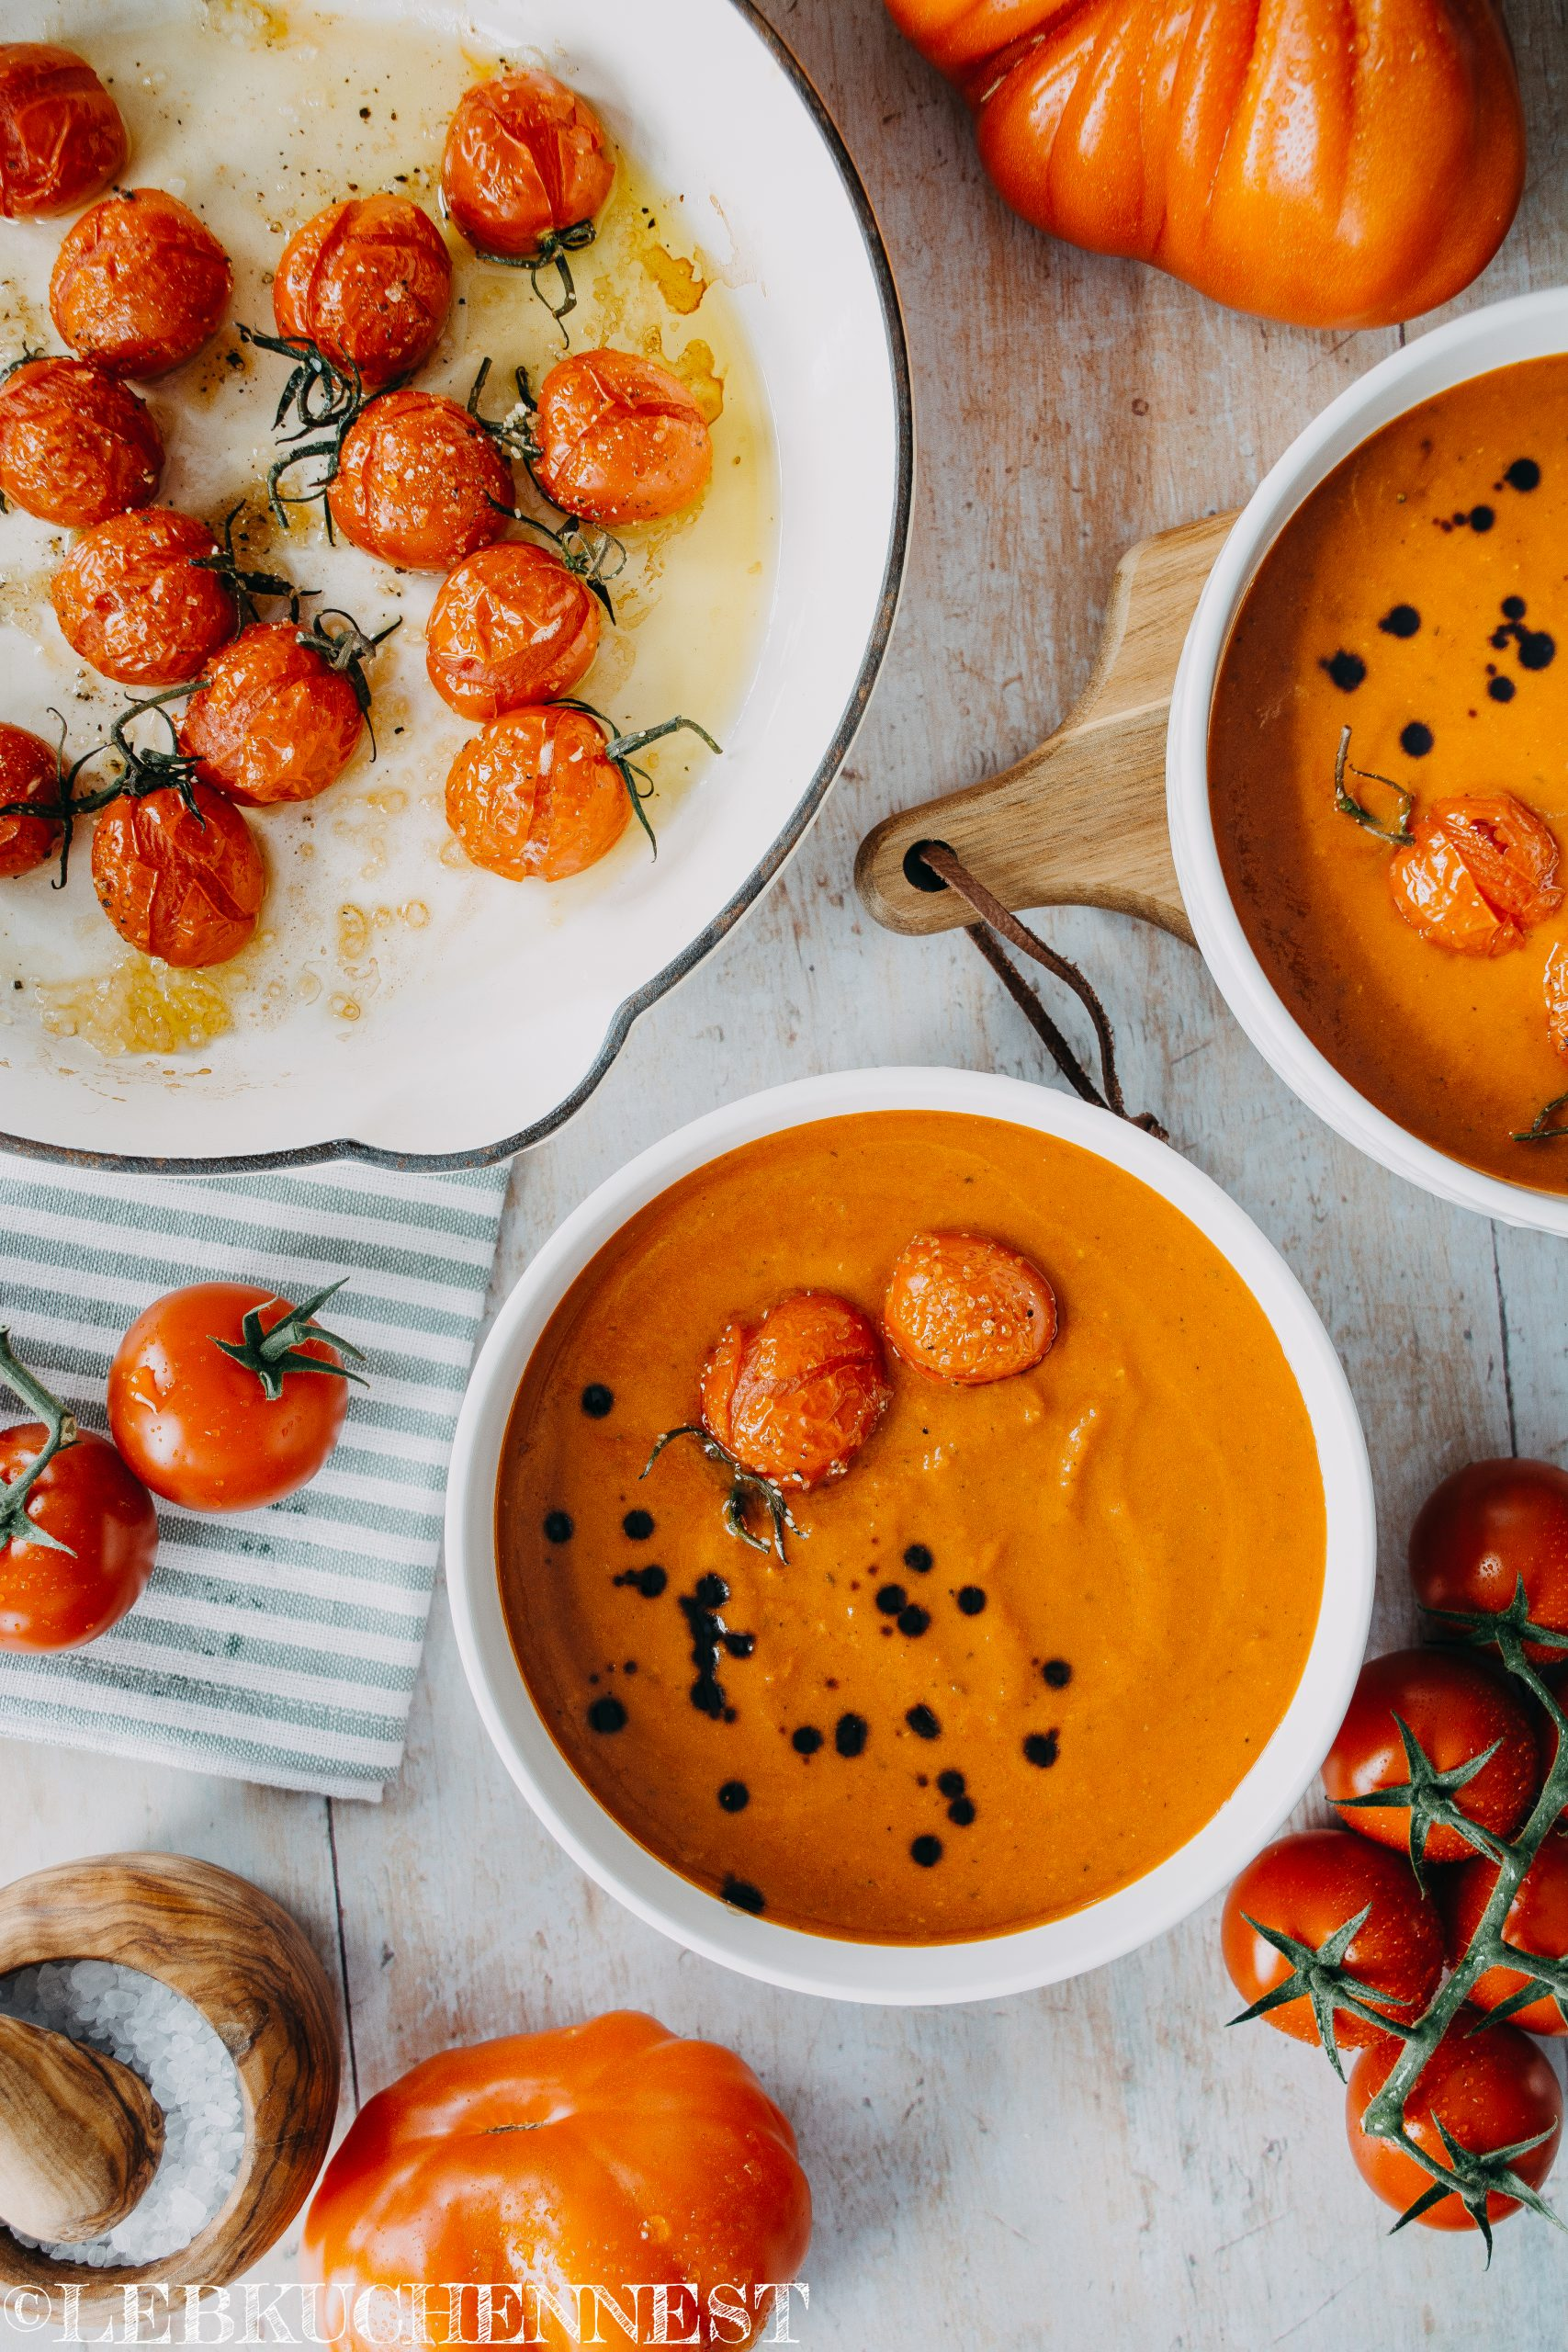 Tomatencremesuppe mit Schmortomaten - All you need is homemade – Lebkuchennest